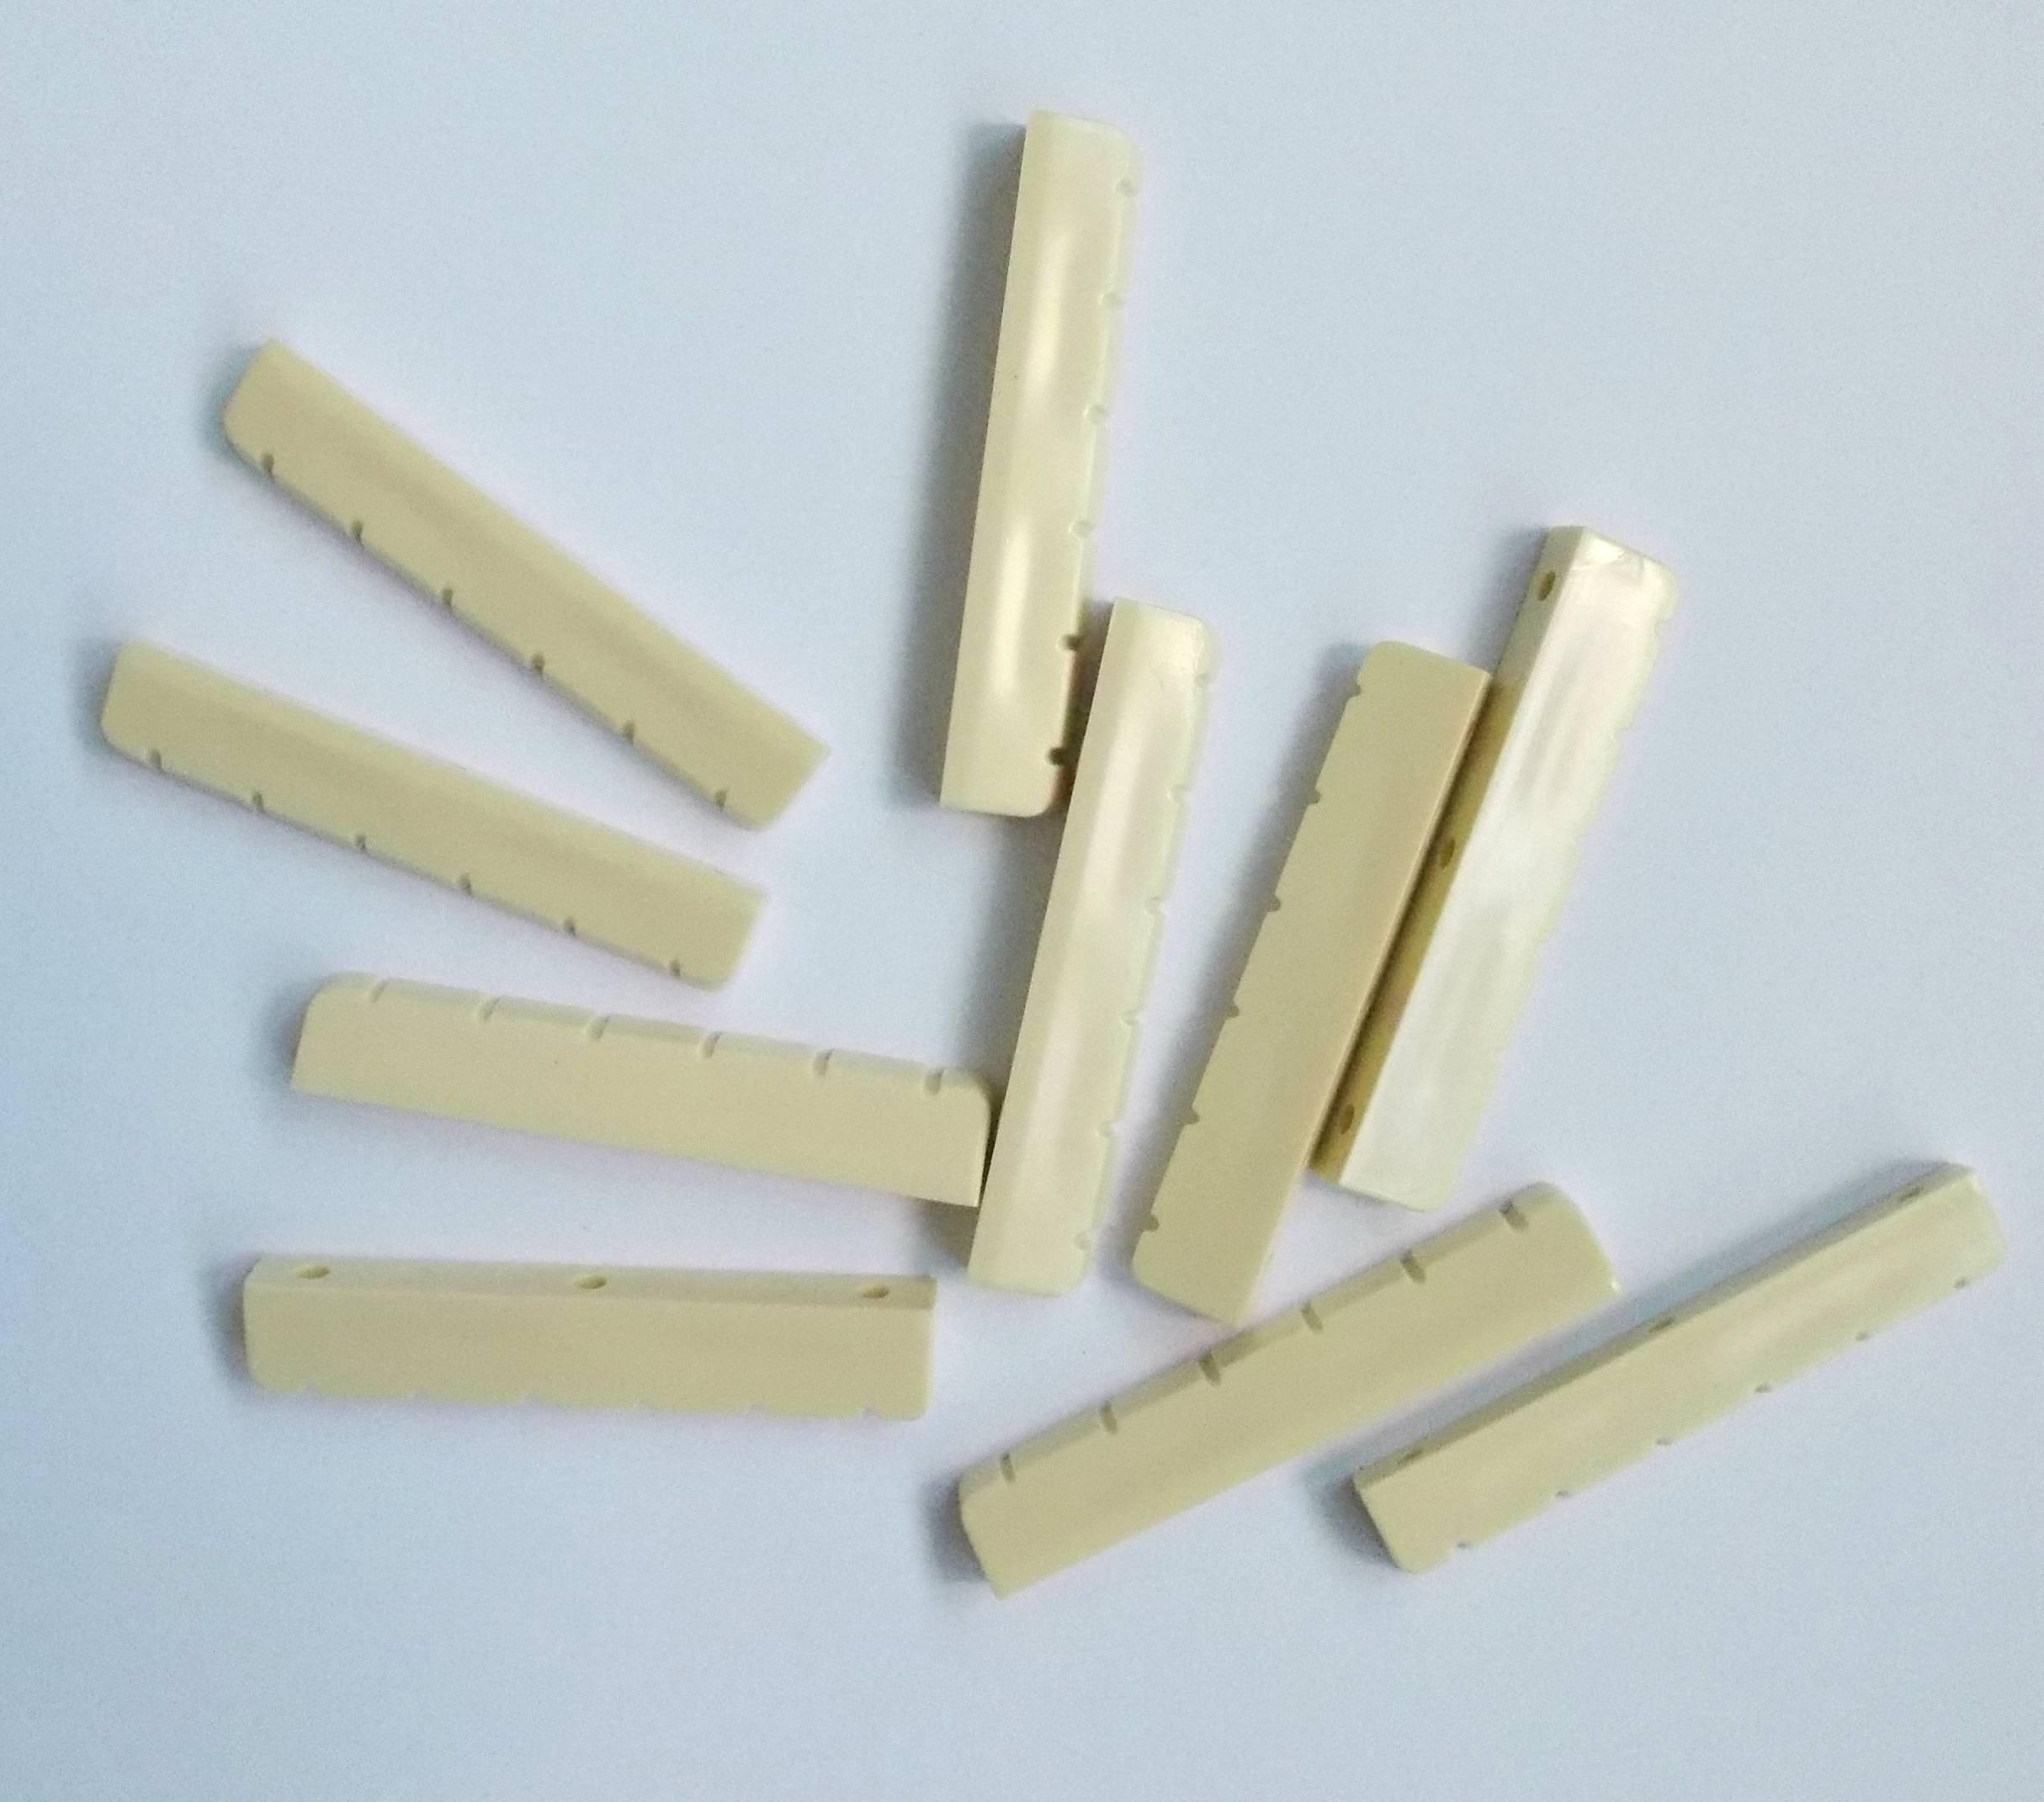 Generic 30 pcs Classical Guitar Nuts Plastic 52.5 x 6 x 9.3-8.8 Ivory